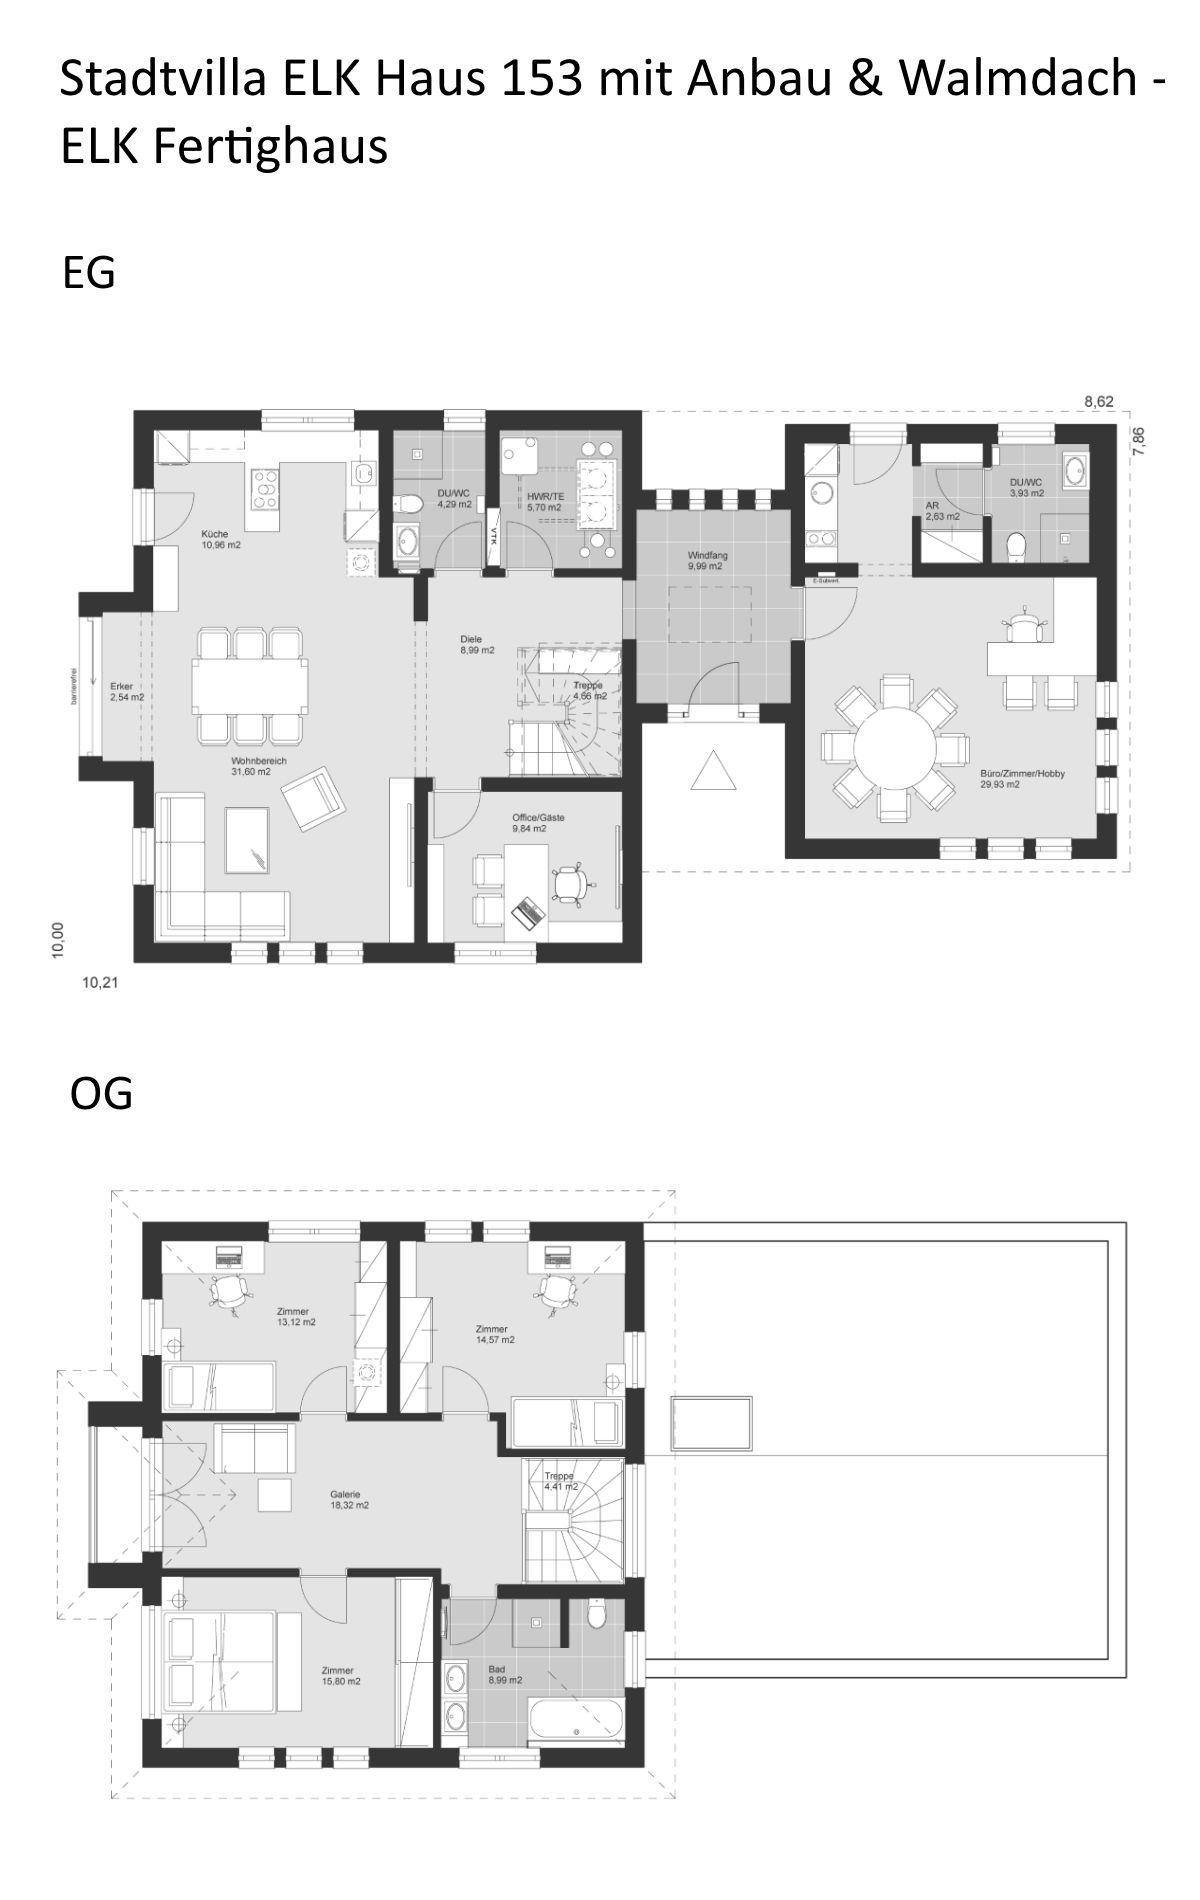 Stadtvilla Grundriss modern mit Büro Anbau & Walmdach